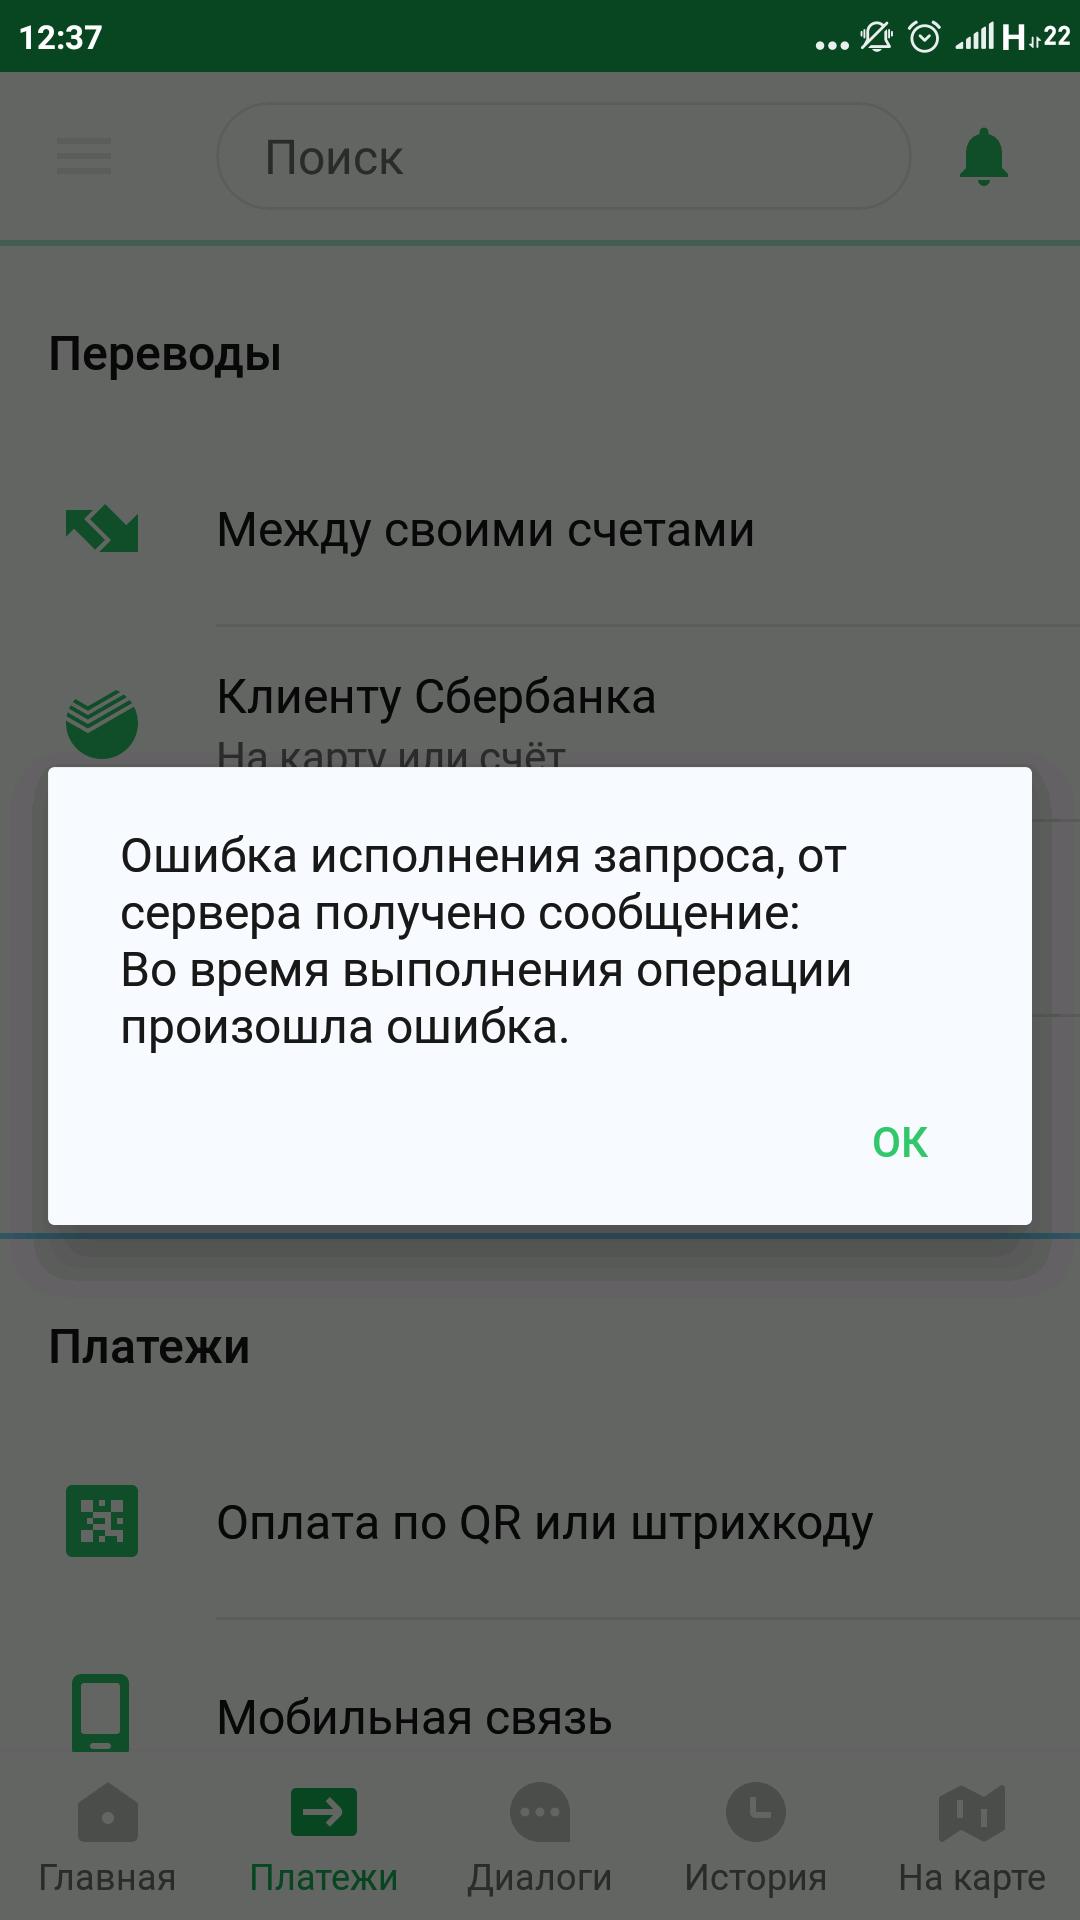 Во время выполнения операции произошла ошибка сбербанк онлайн [PUNIQRANDLINE-(au-dating-names.txt) 64